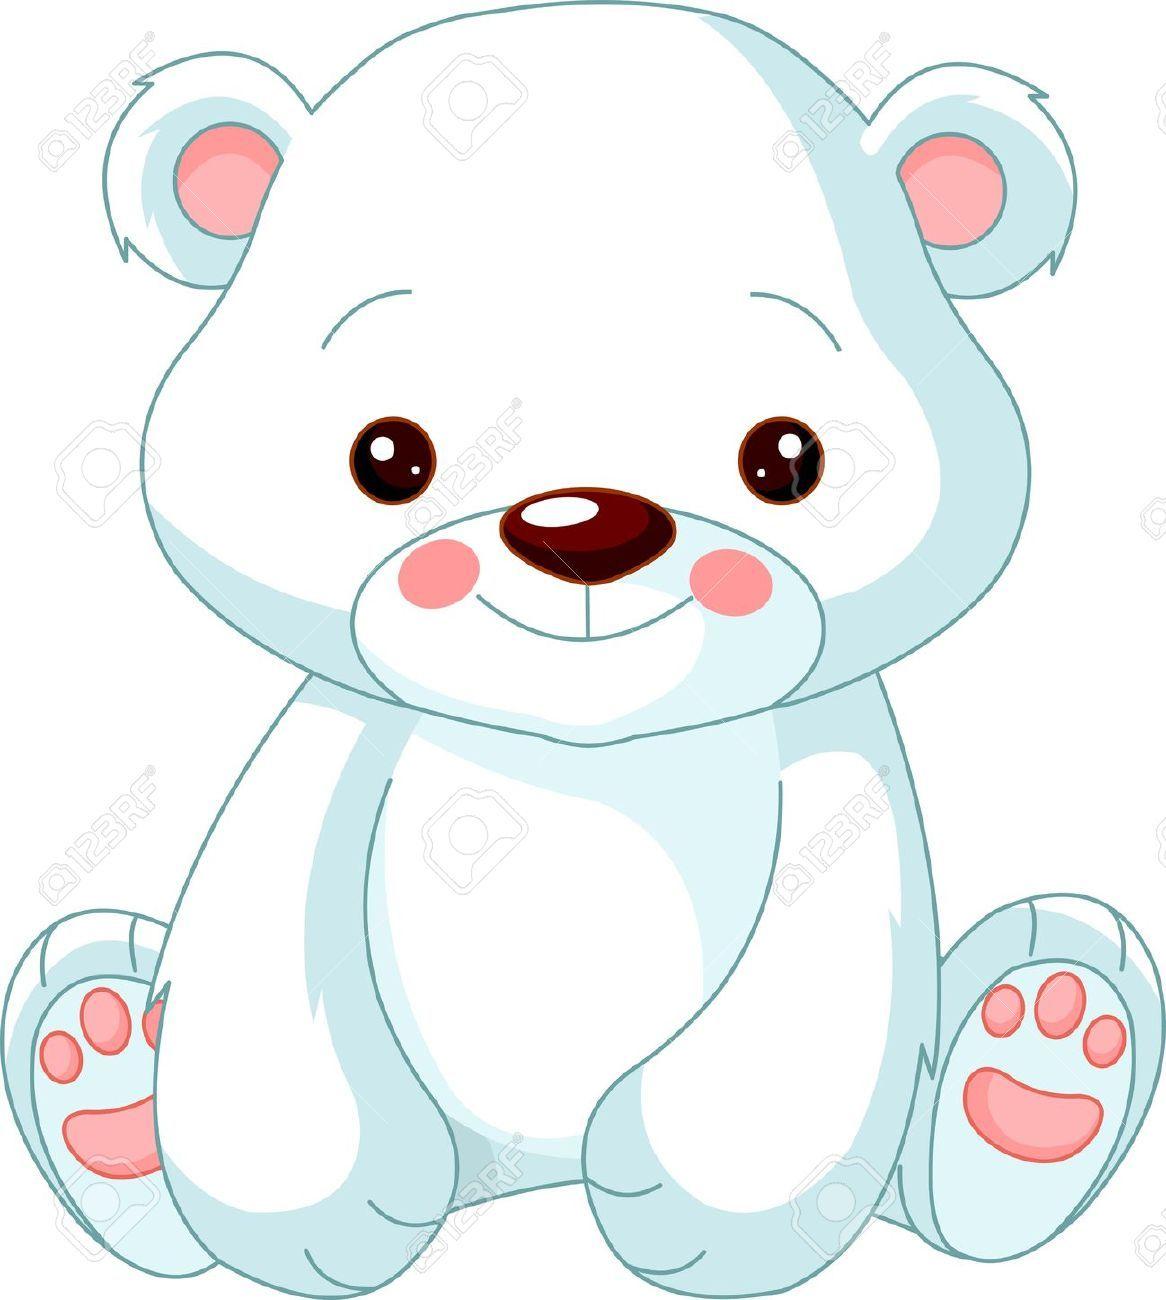 Resultado de imagen para osos polares animados  dibujos de